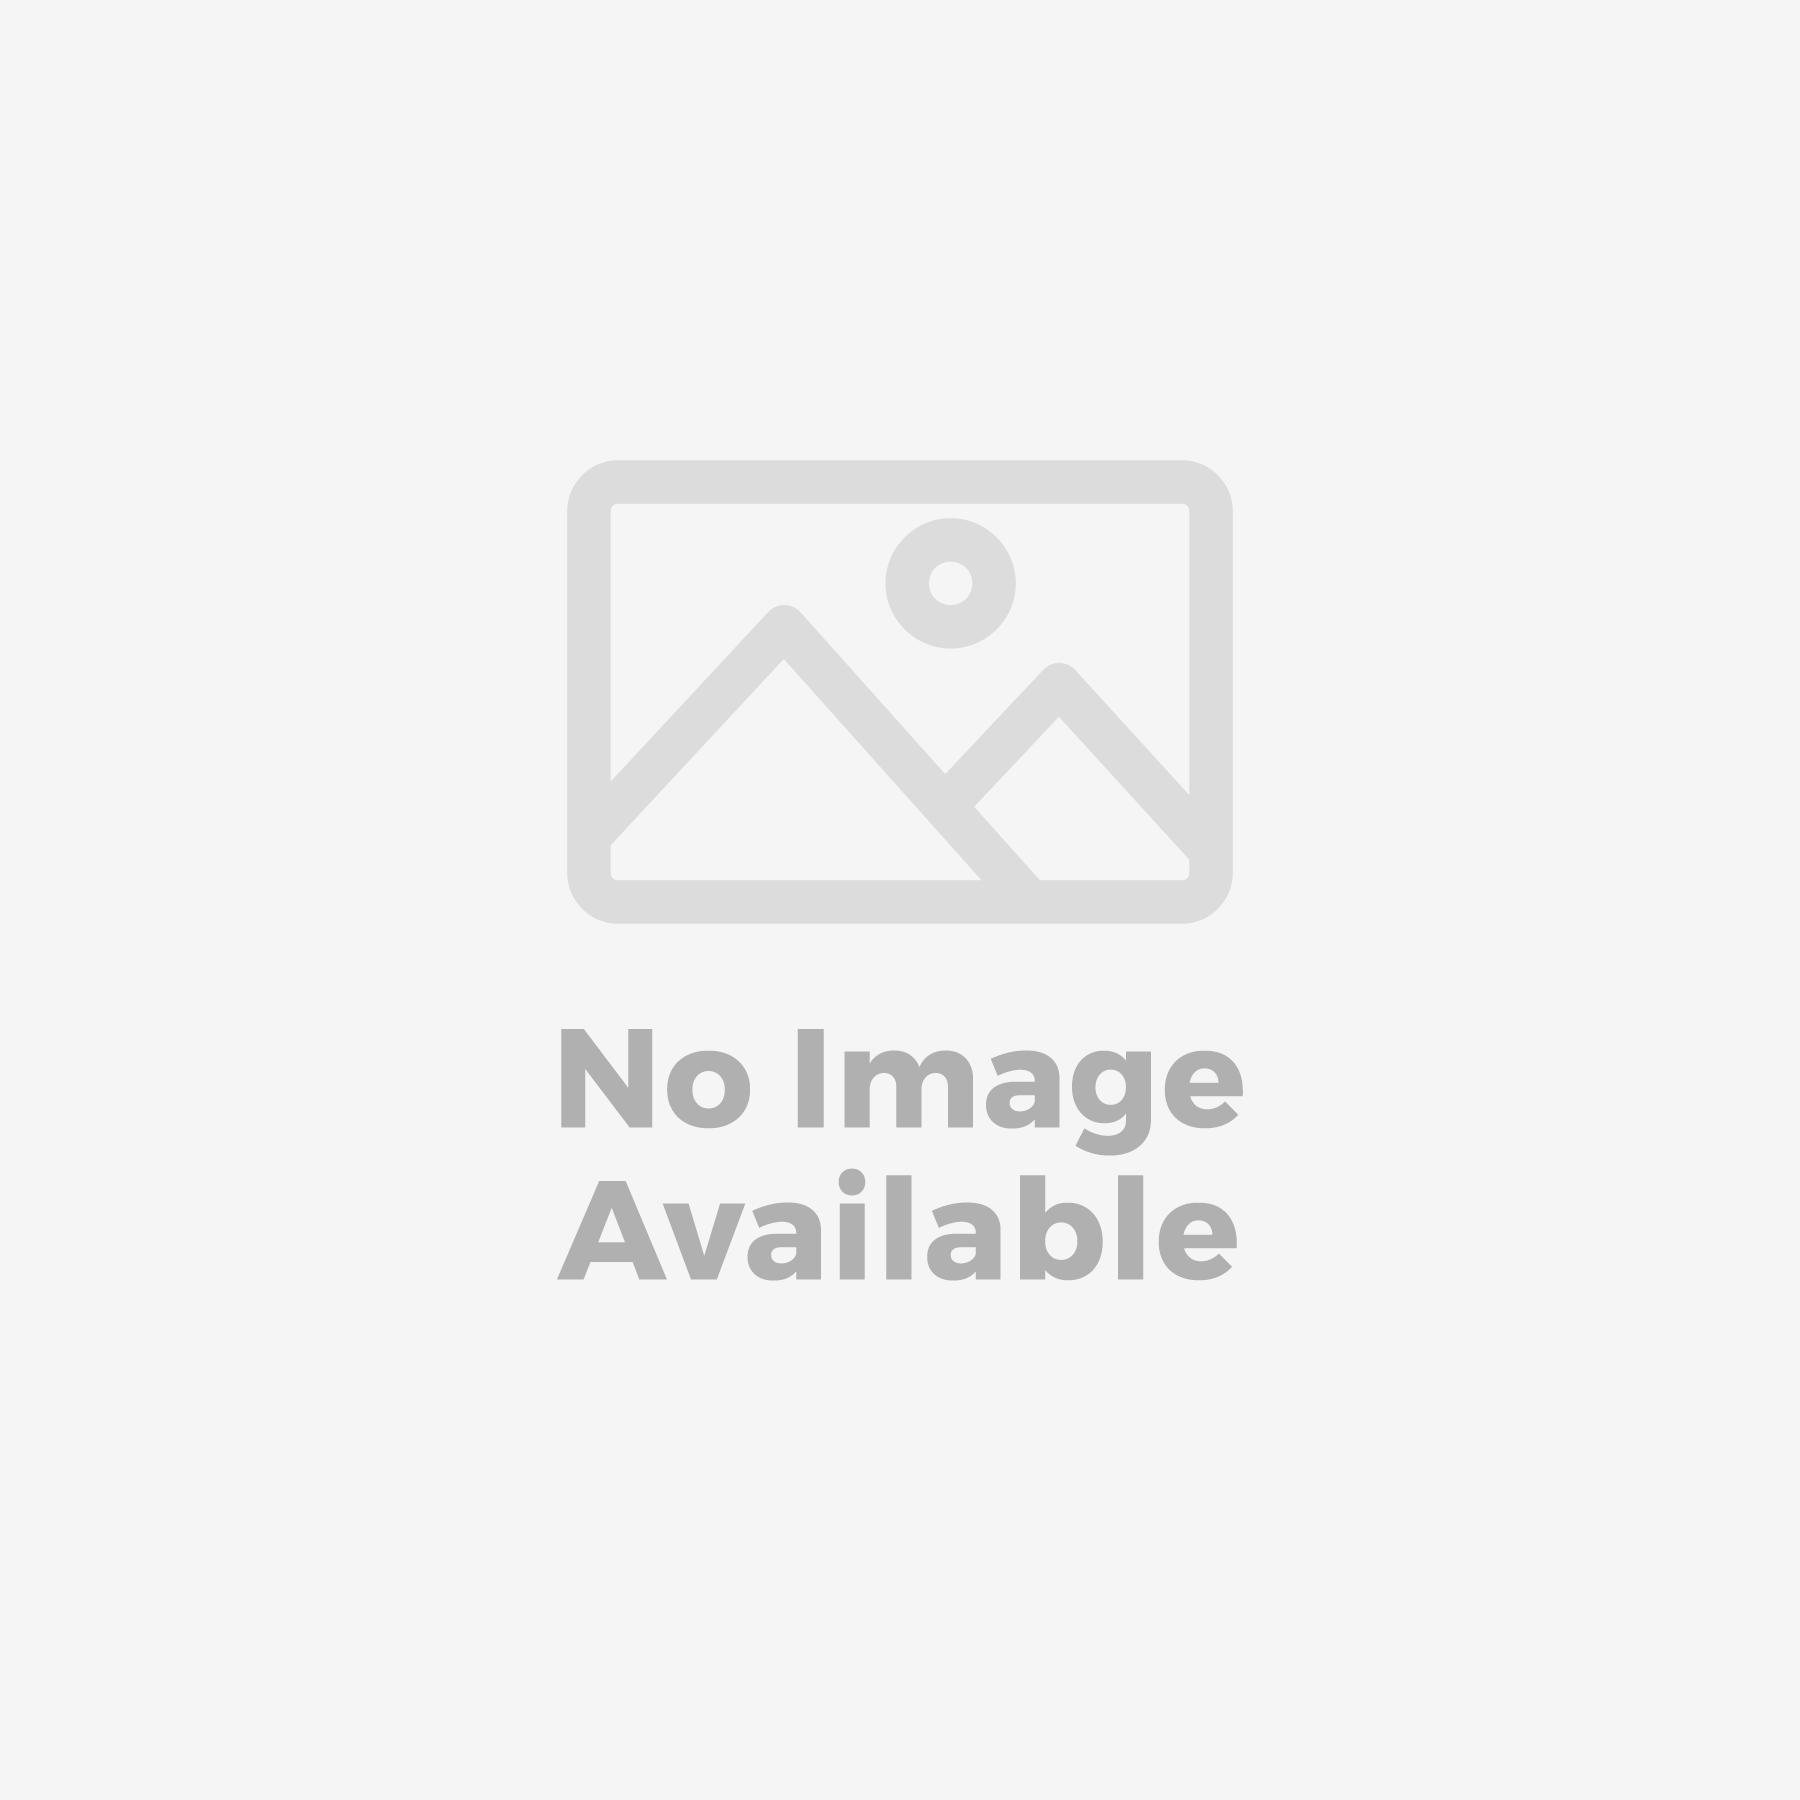 "TORRE 2 - 11.5"" Craquele White Porcelain Vase/Sculpture"